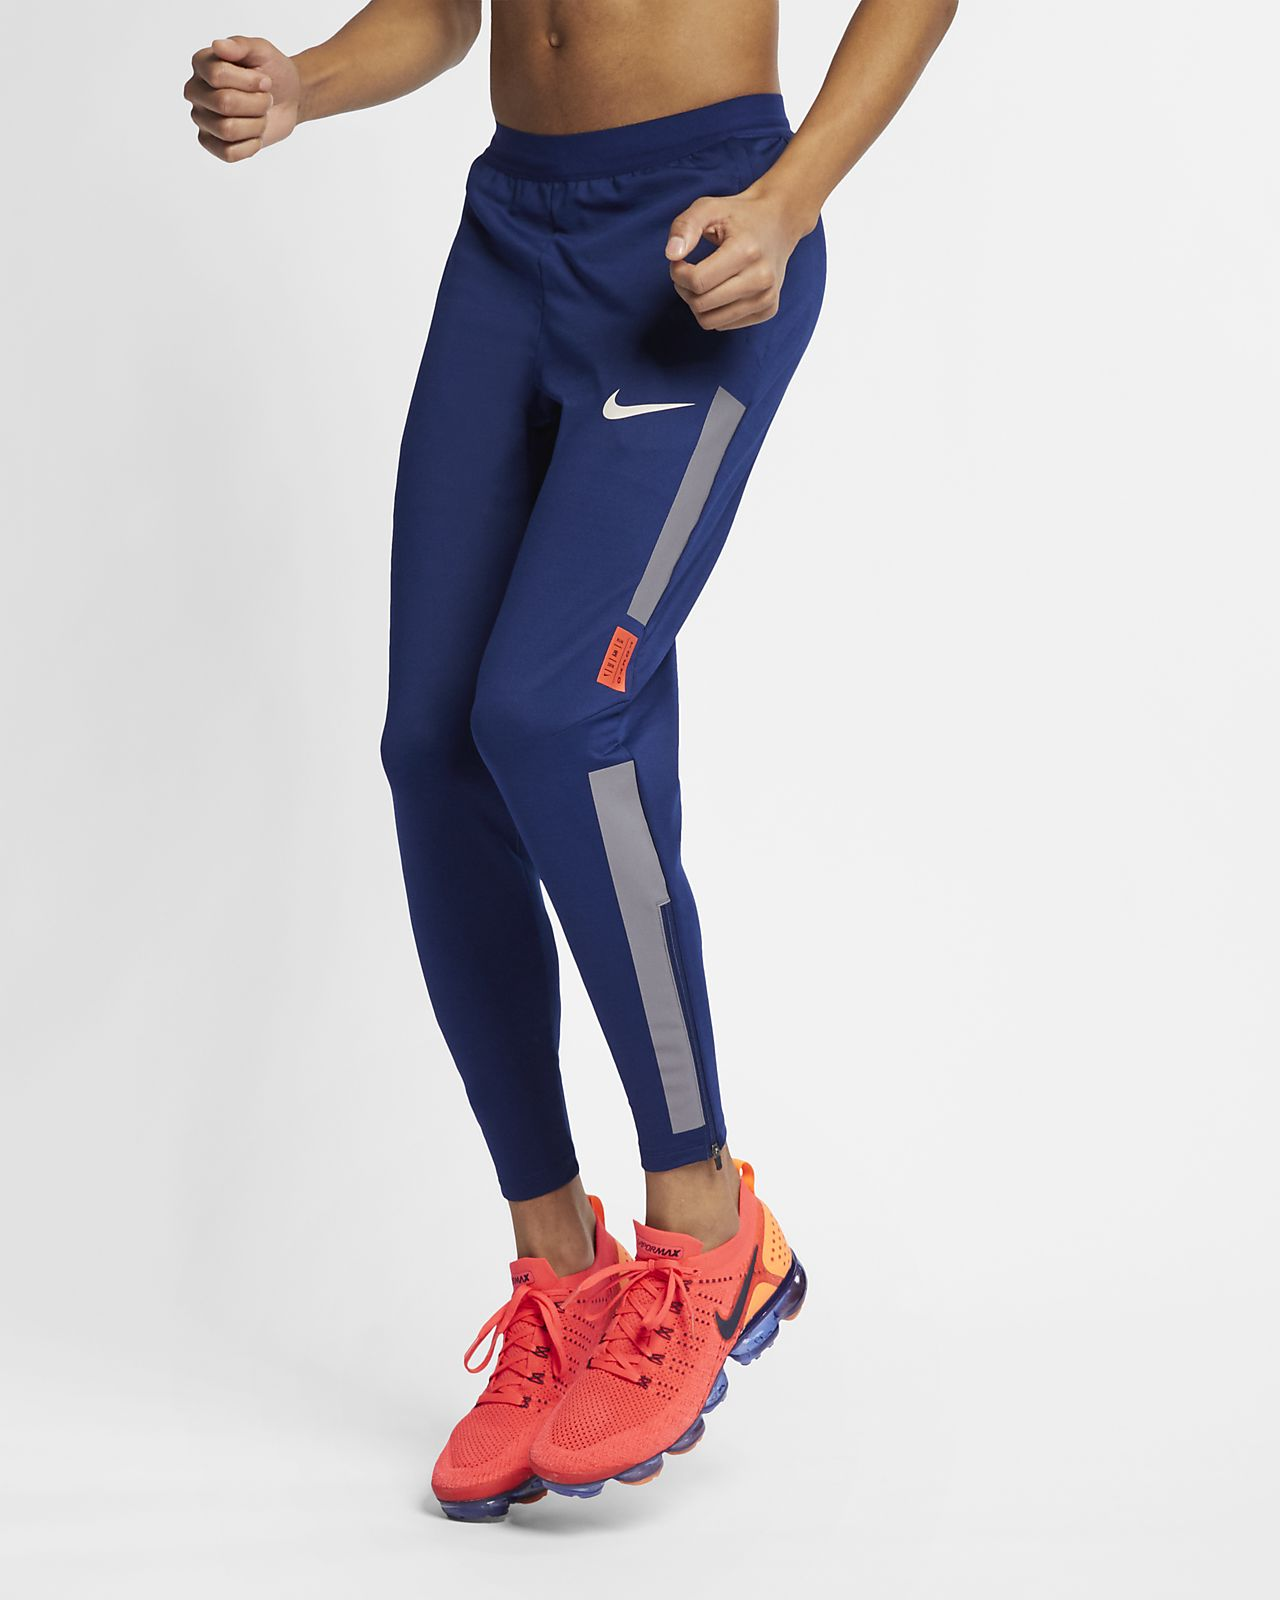 740c34bffcc3 Nike Phenom Men s Running Trousers. Nike.com HR